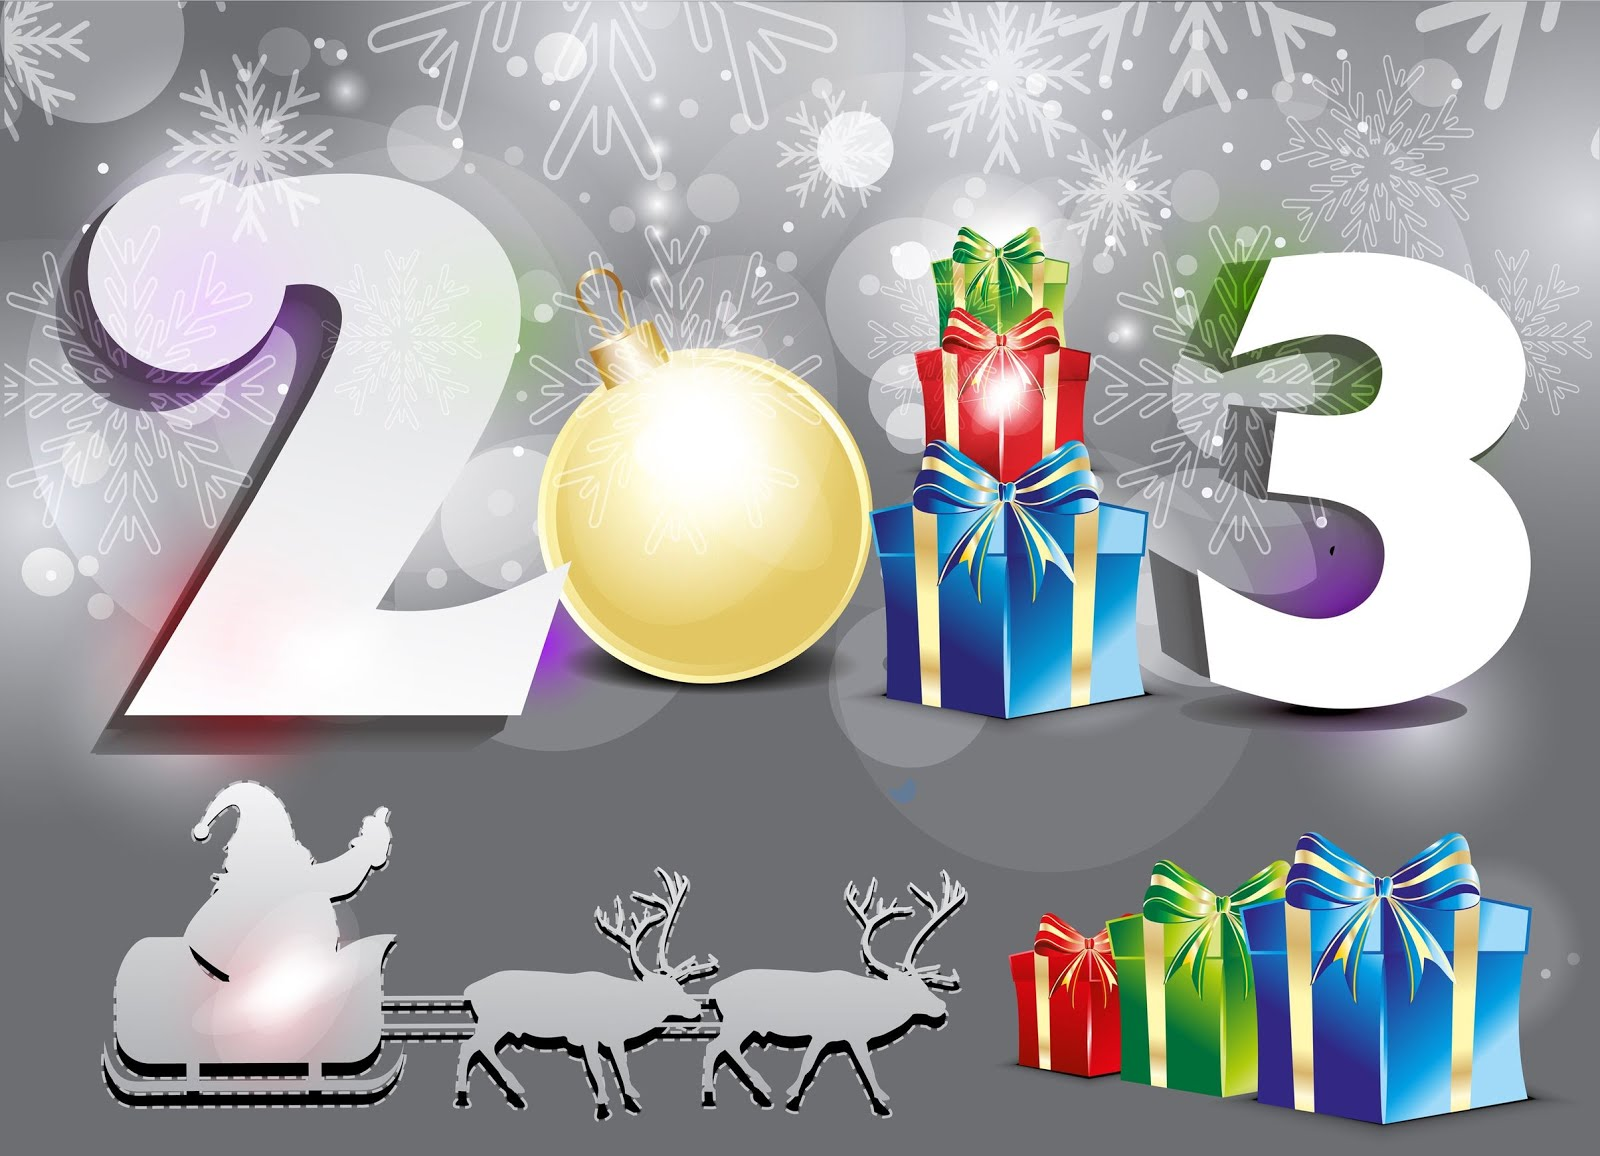 http://1.bp.blogspot.com/-tEQg25wGTEU/UMT6sjK48mI/AAAAAAABWNU/1R5dLO2Jq3I/s1600/wallpaper-de-a%25C3%25B1o-nuevo-2013-fondos-gratis-new-year.jpg